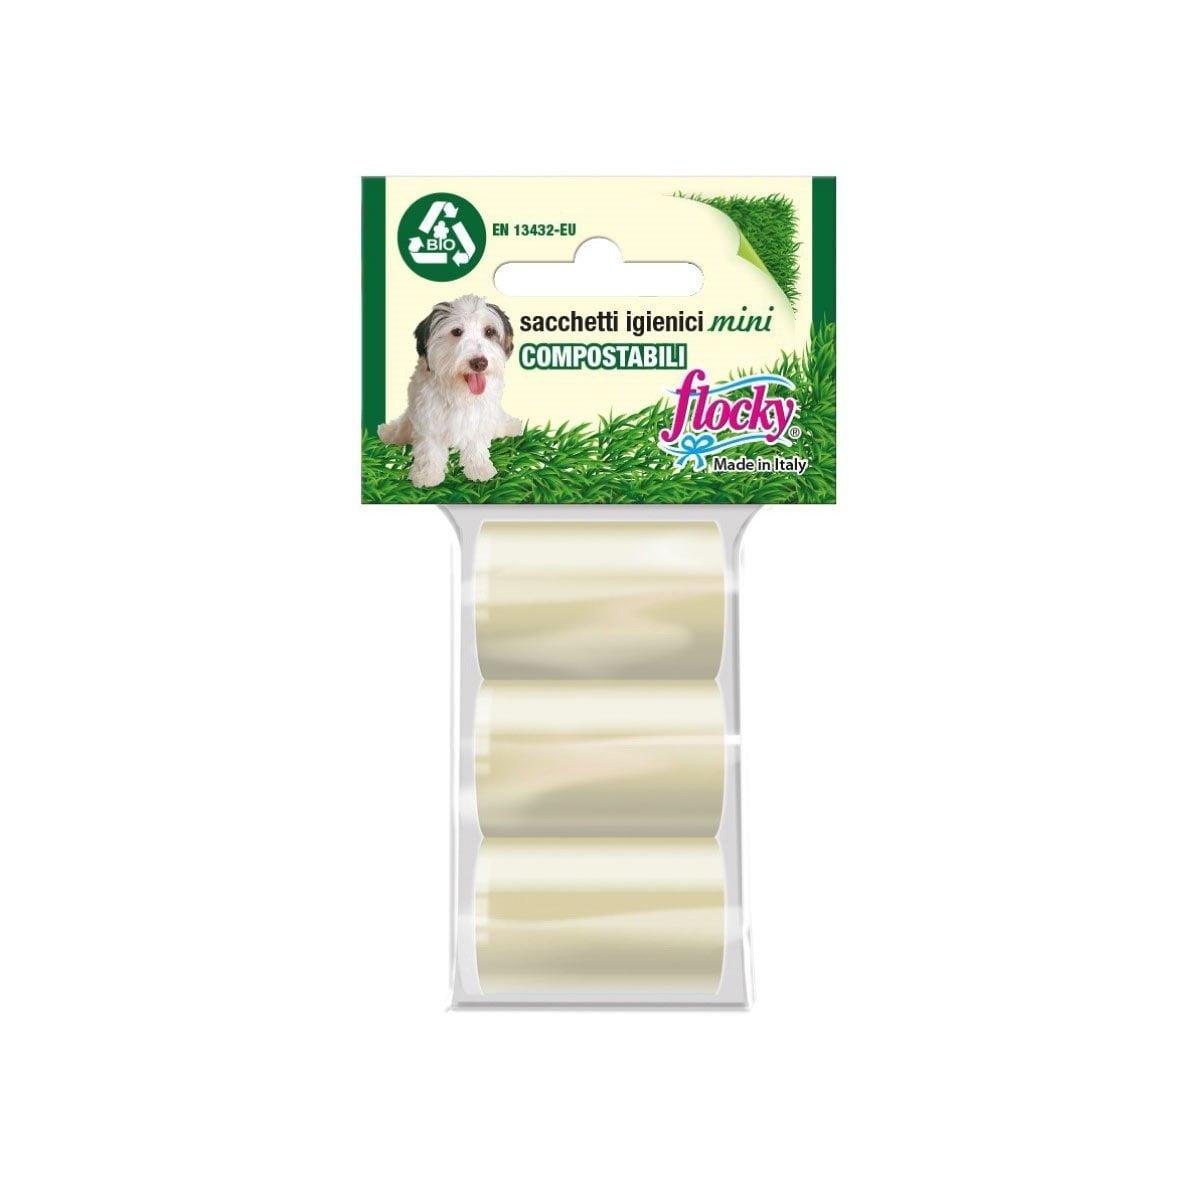 Flocky | Sacchetti igienici per cani | Linea Compostabili-Bio | art.116